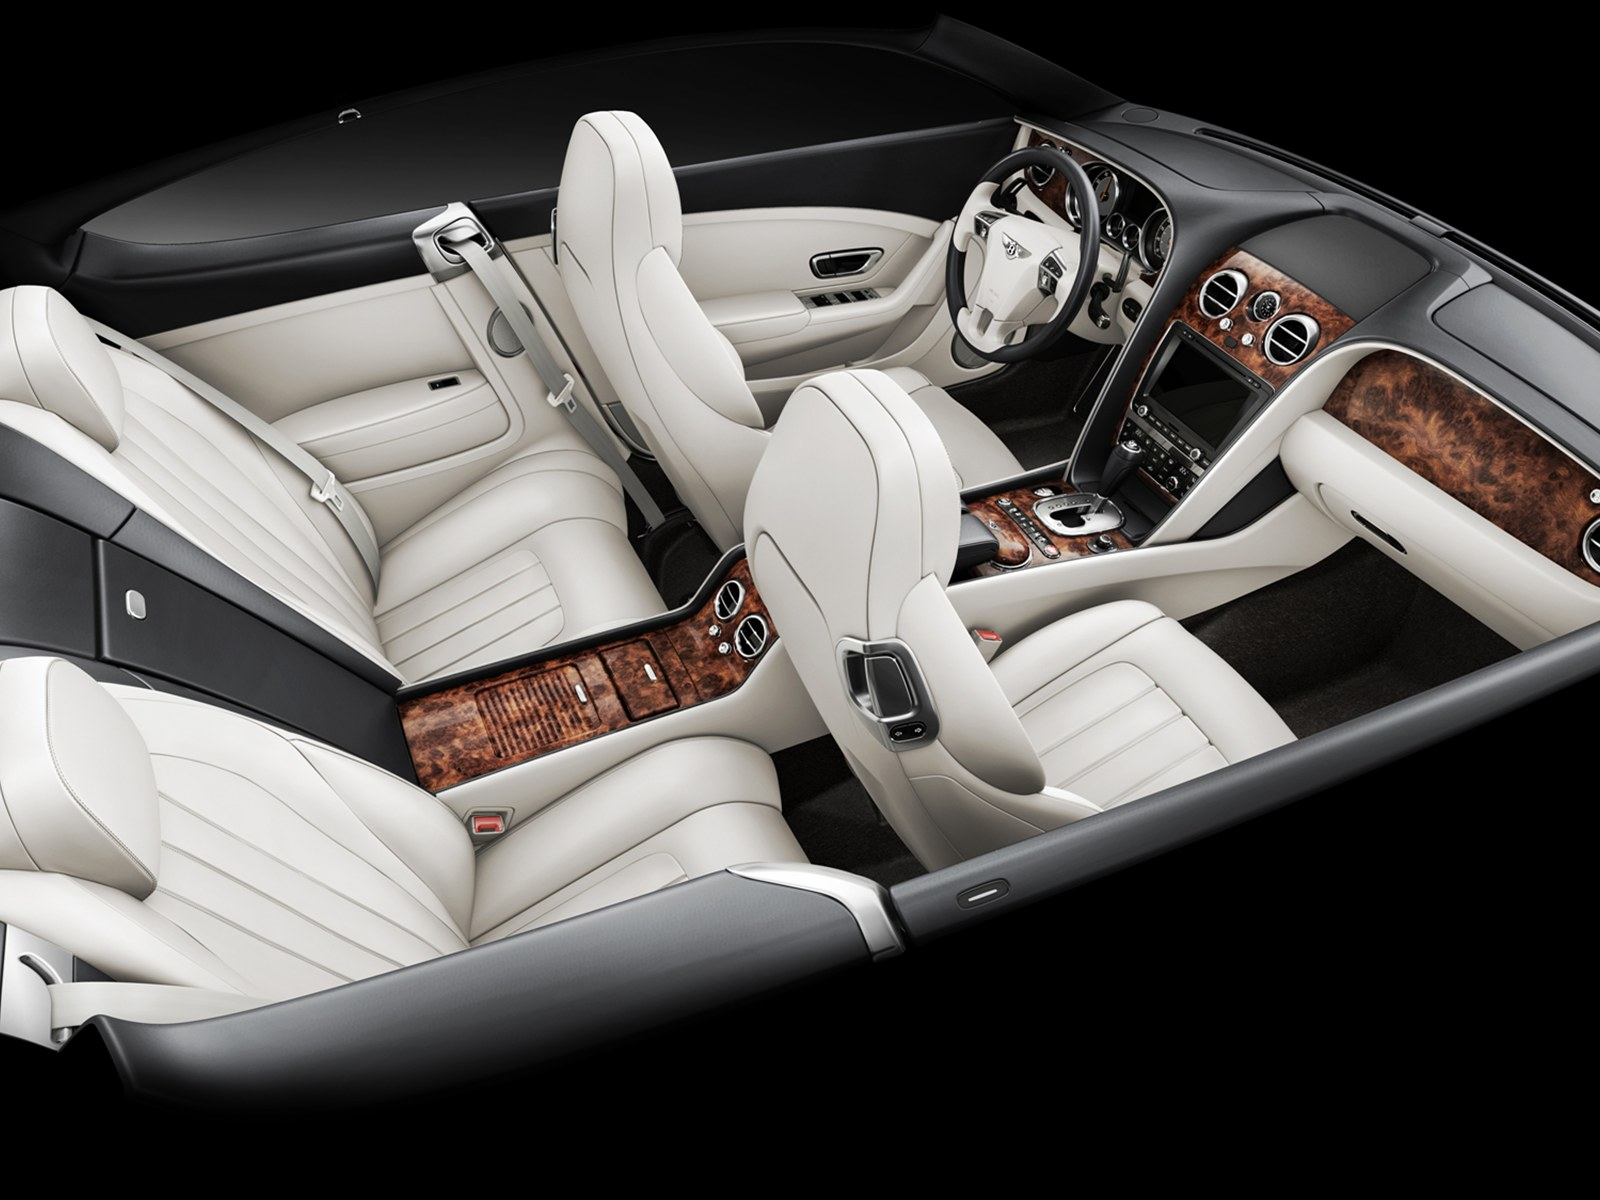 ... Images, Car Wallpapers, Car Models Name: 2012 Bentley Continental GTC